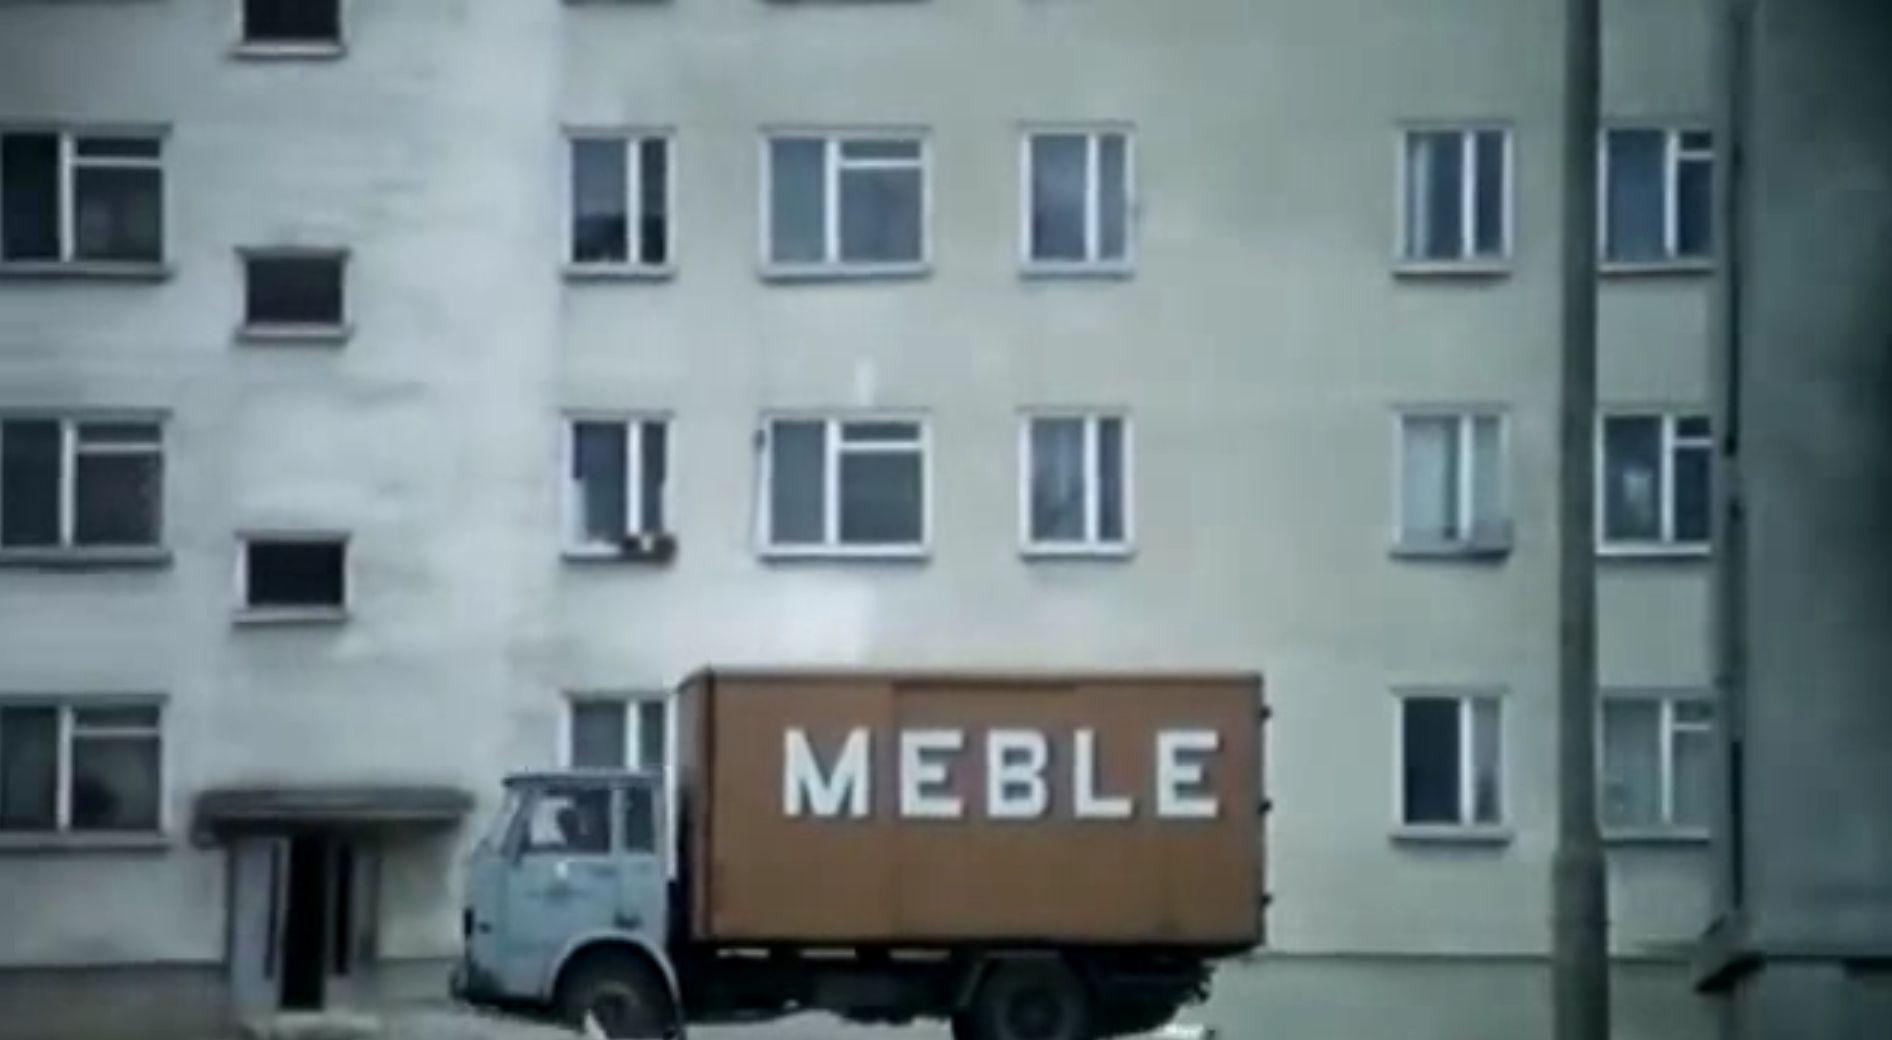 064 - Star meble.jpg